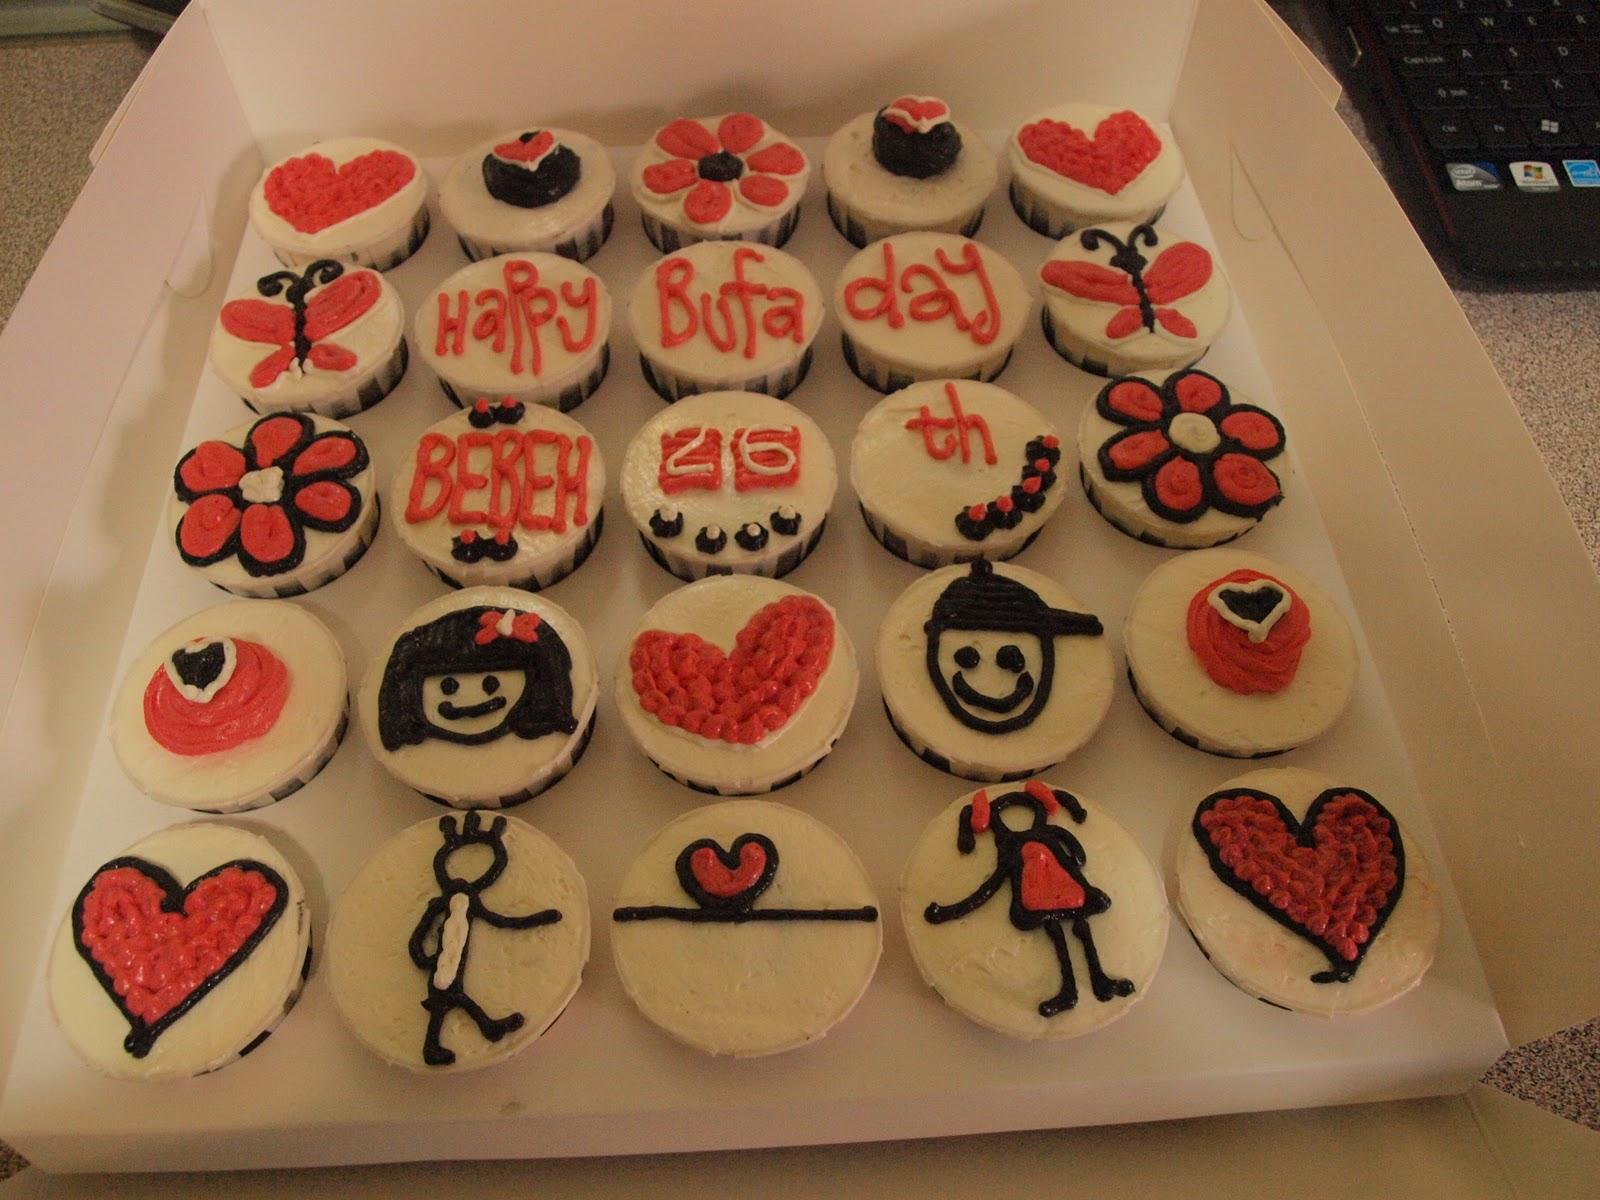 boyfriend cupcakes - photo #19